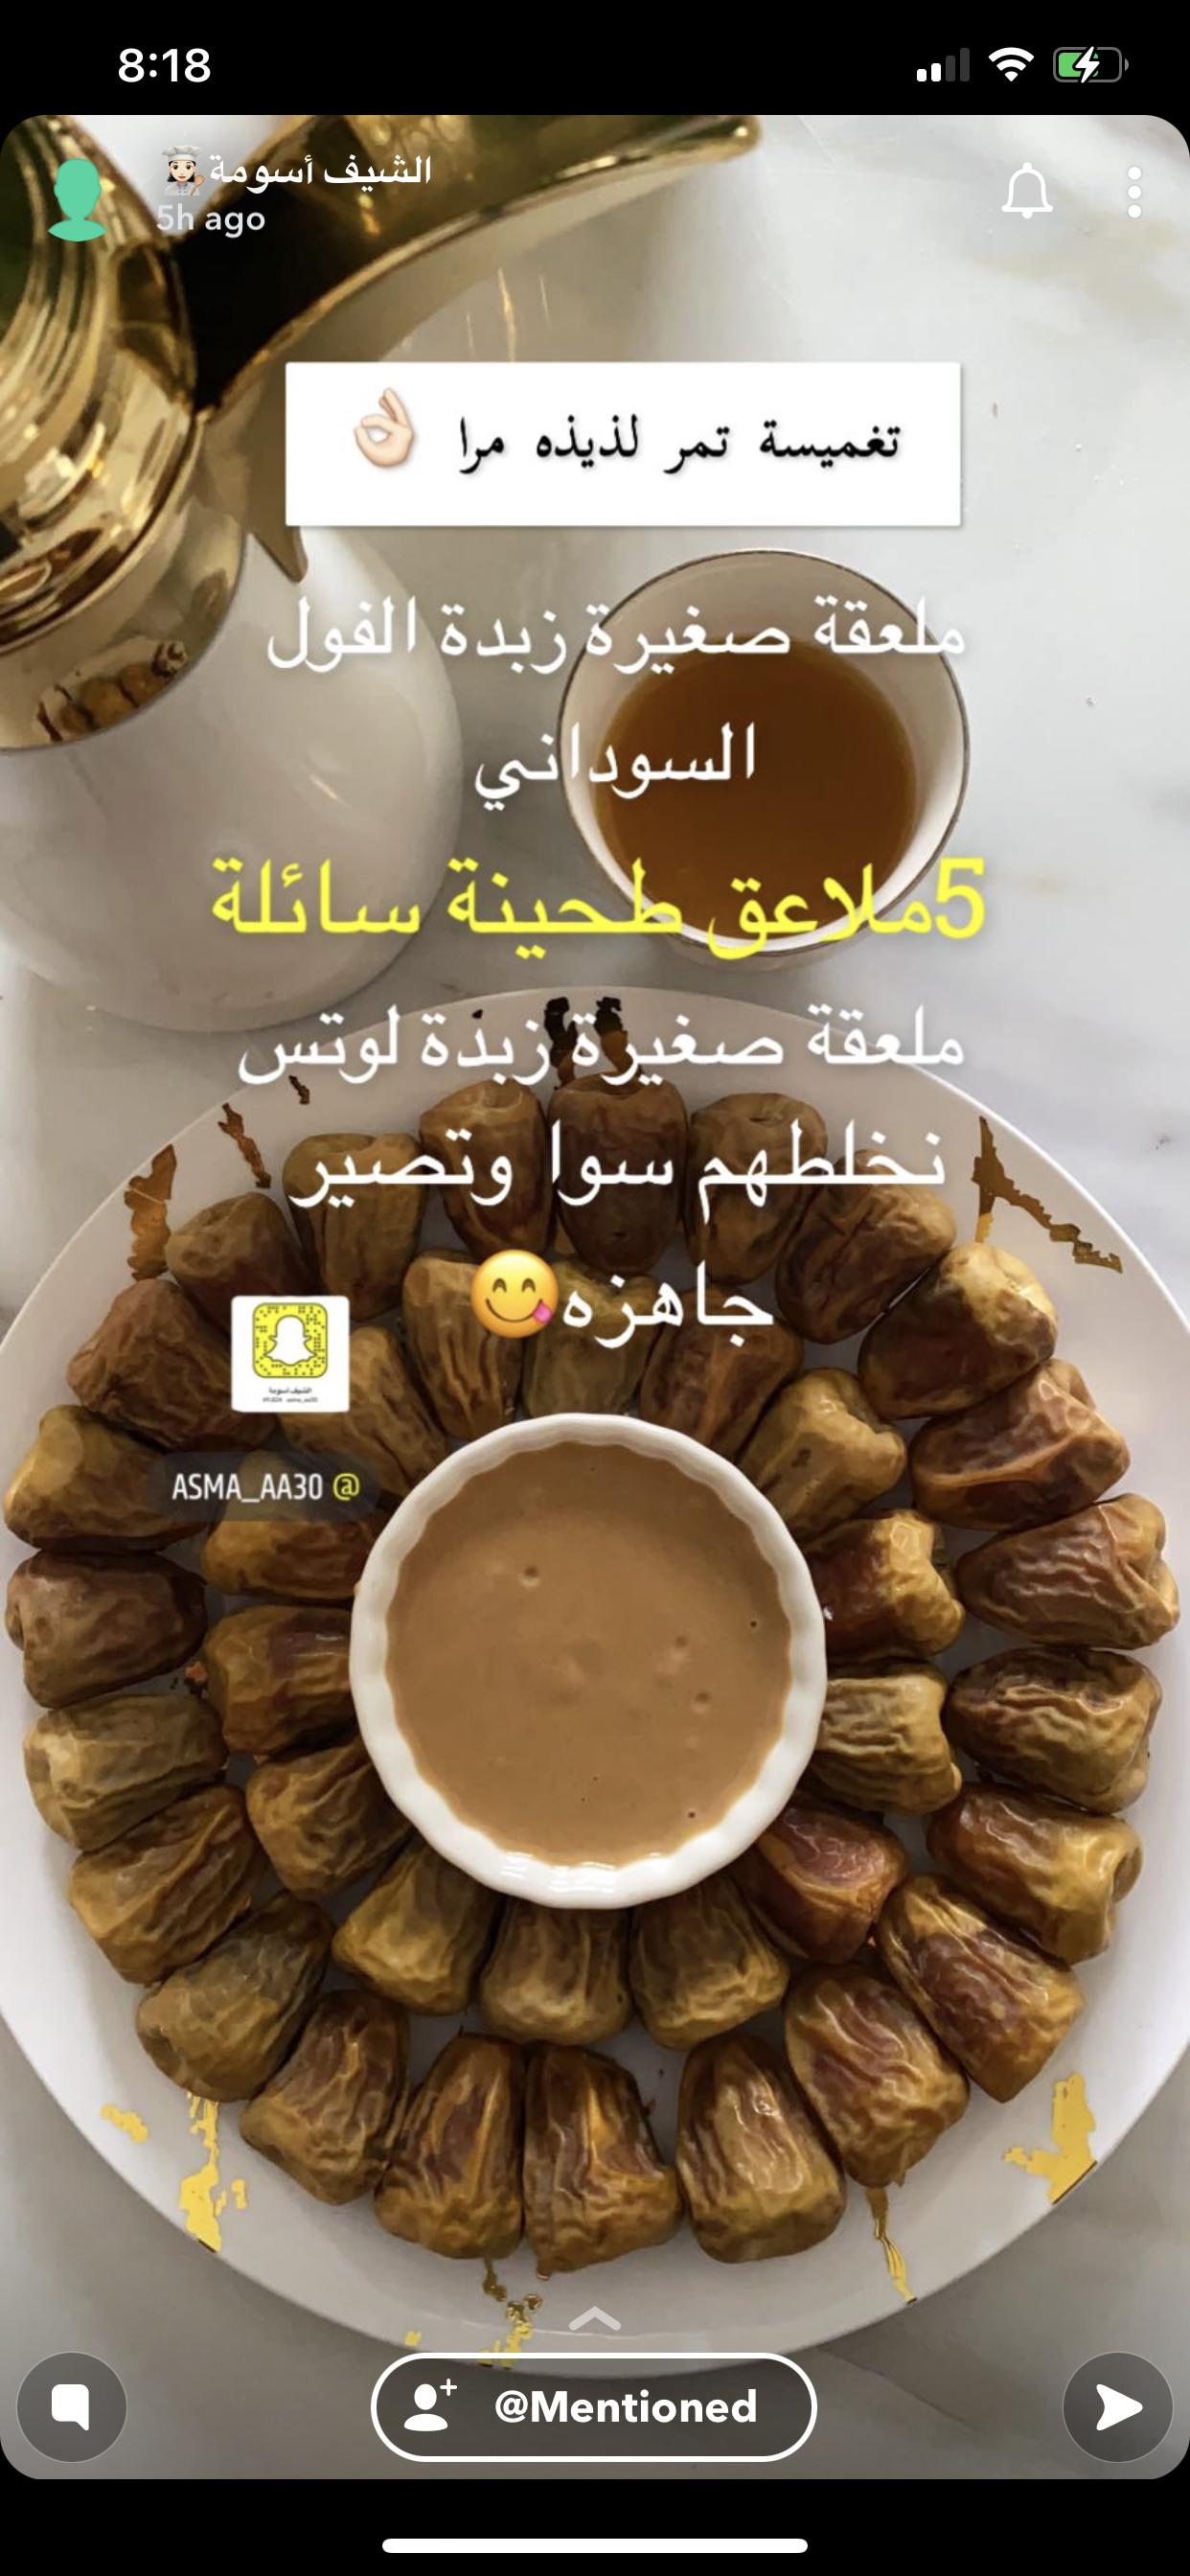 Pin By Maryam Alali On اكلات شعبيه In 2021 Food Desserts Chocolate